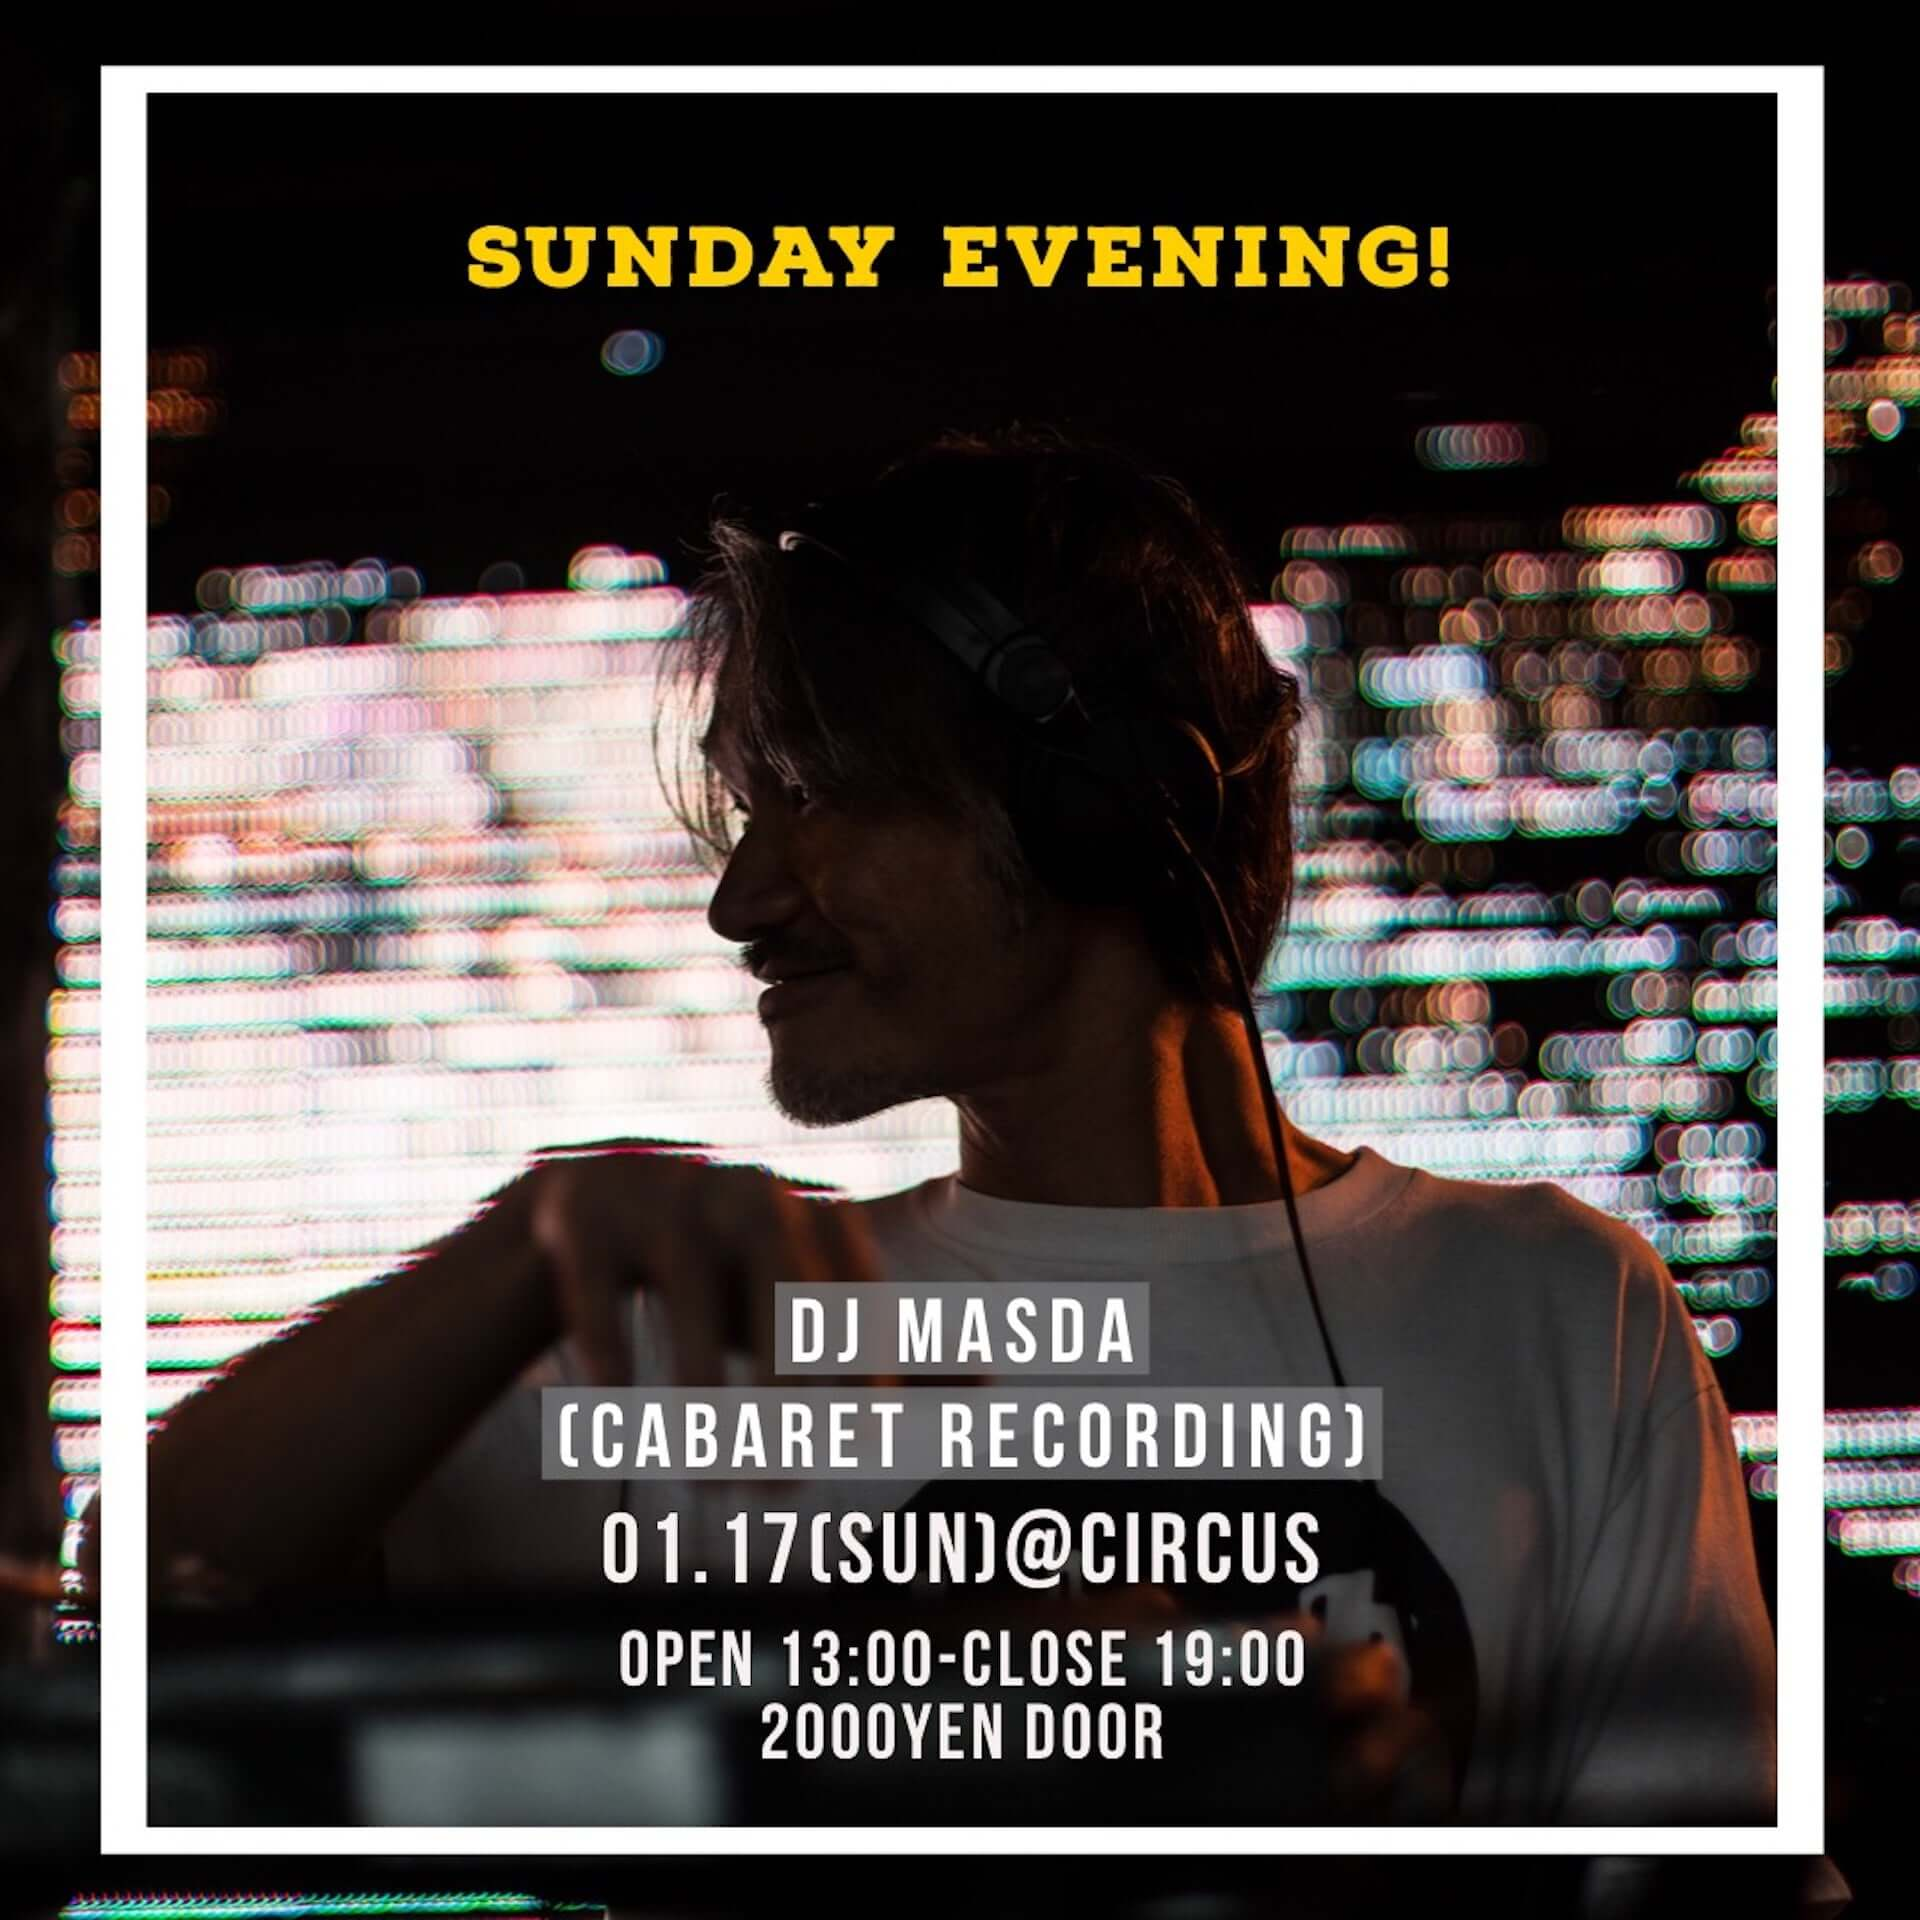 dj masdaの6時間セット・ワンマン公演がCIRCUS OSAKAにて開催決定!デイタイムで実施&フード出店はtamutamucafe music210113_dj-masda_2-1920x1920